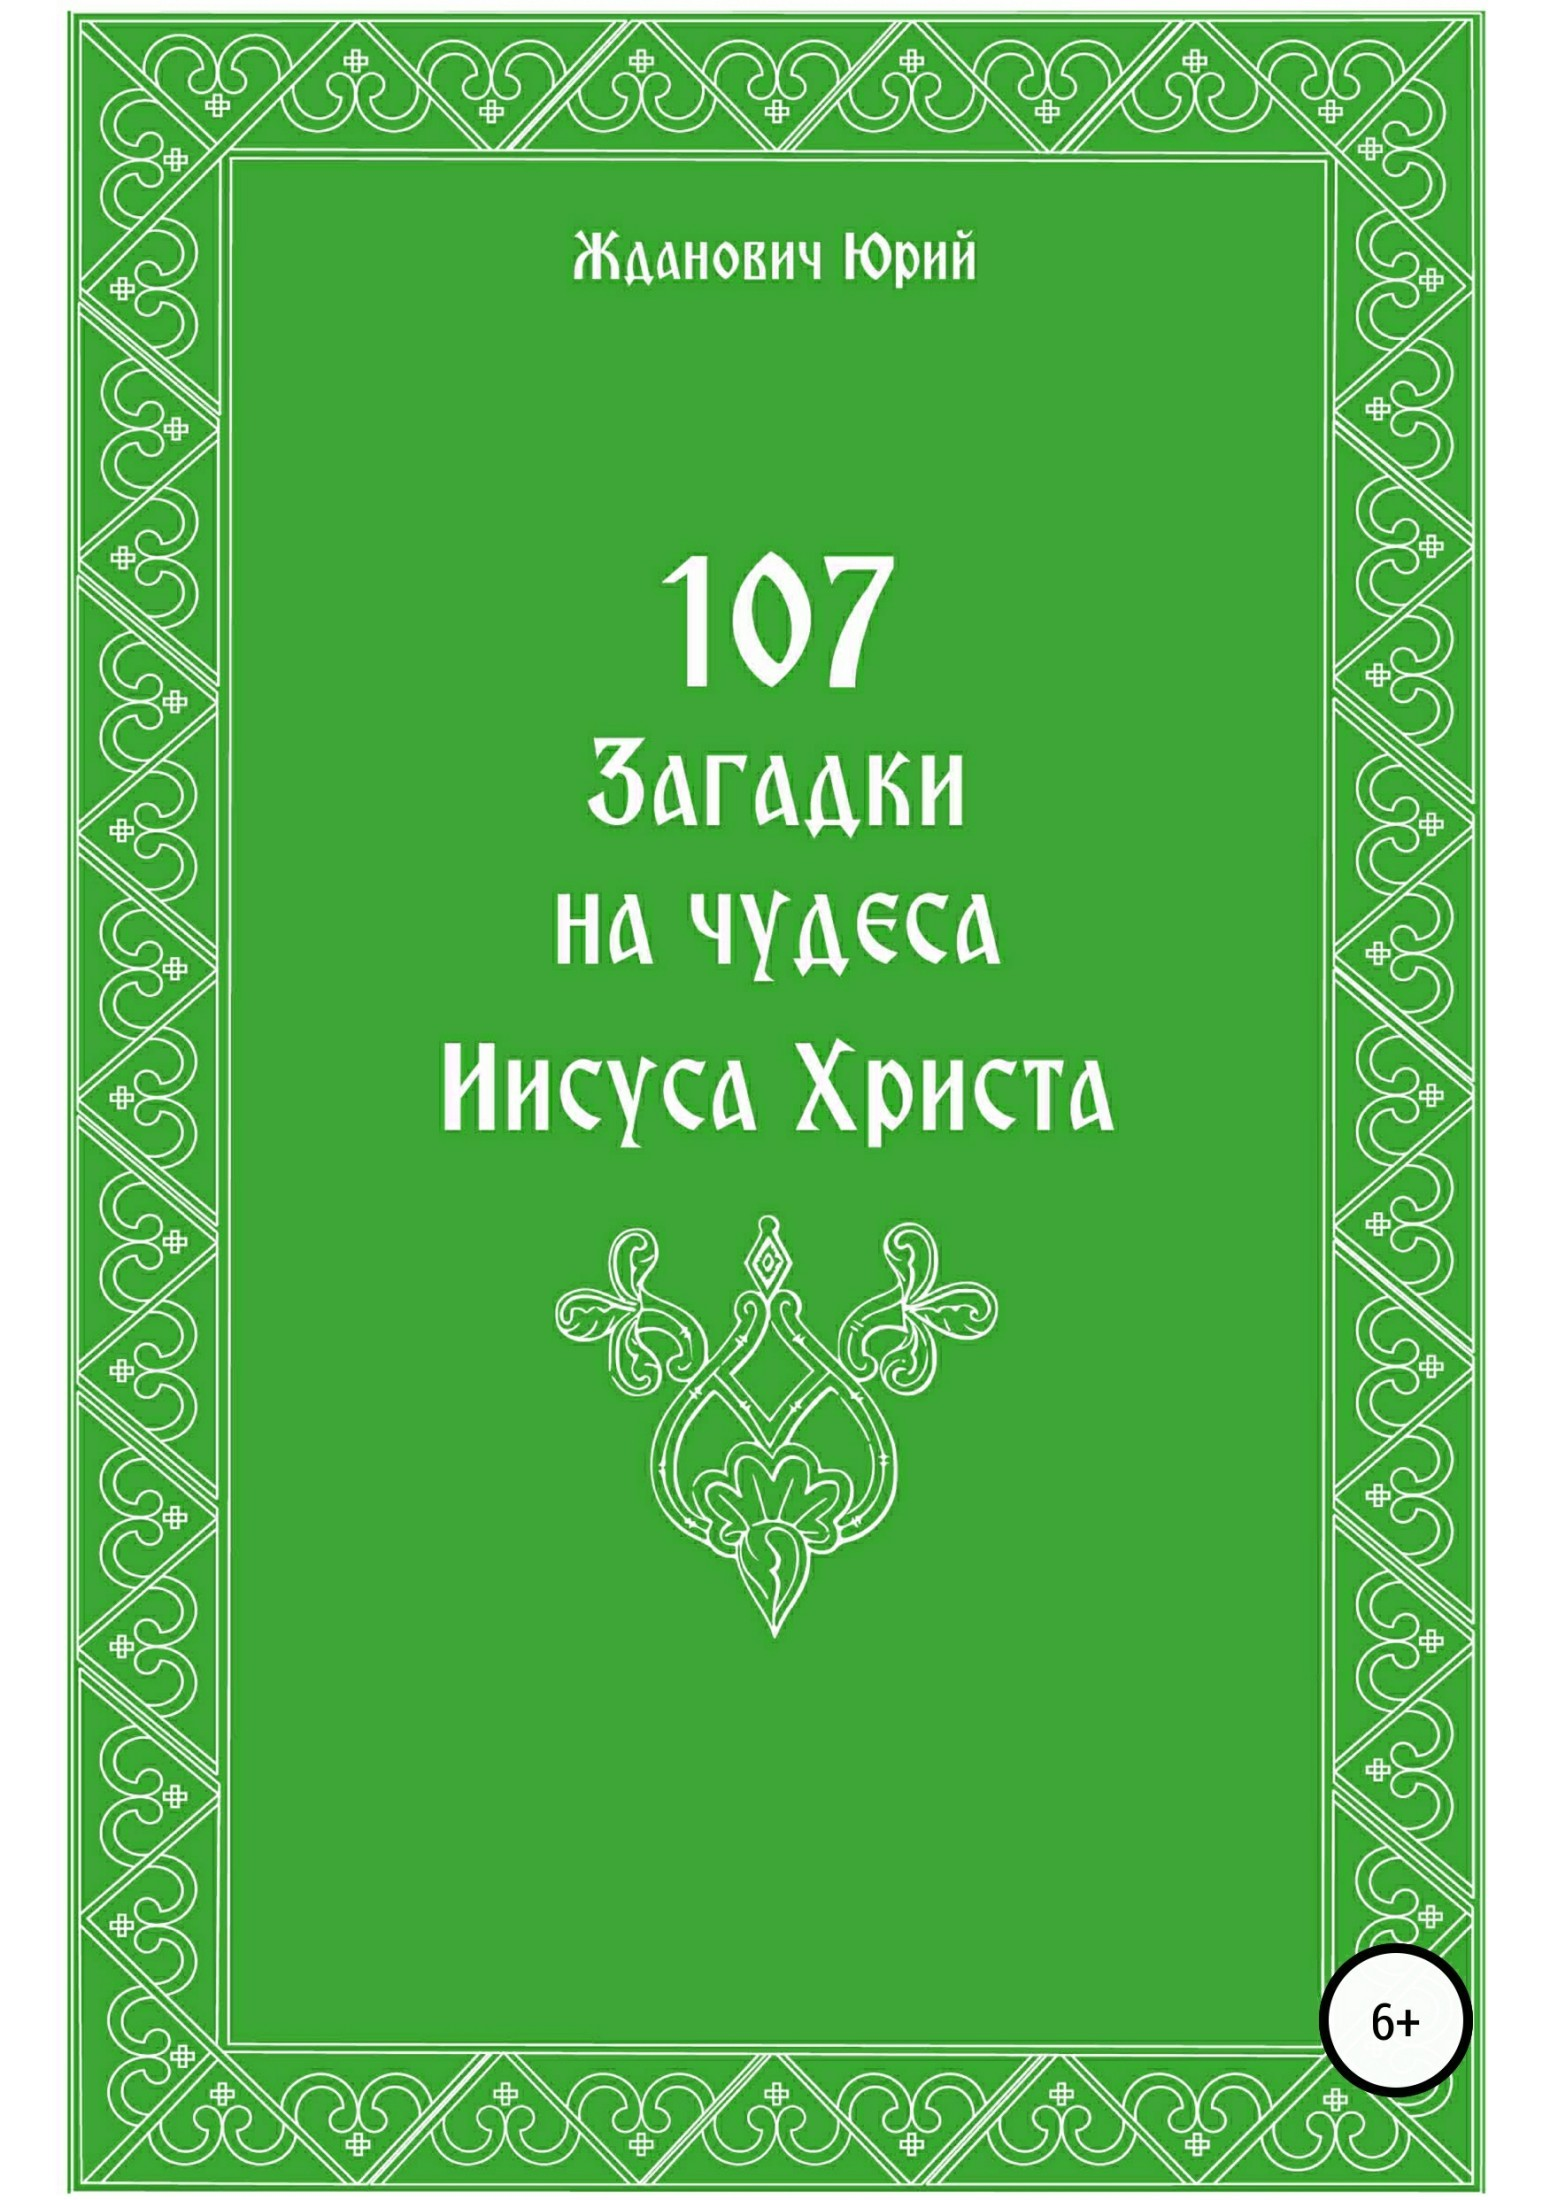 107 загадок на чудеса Иисуса Христа